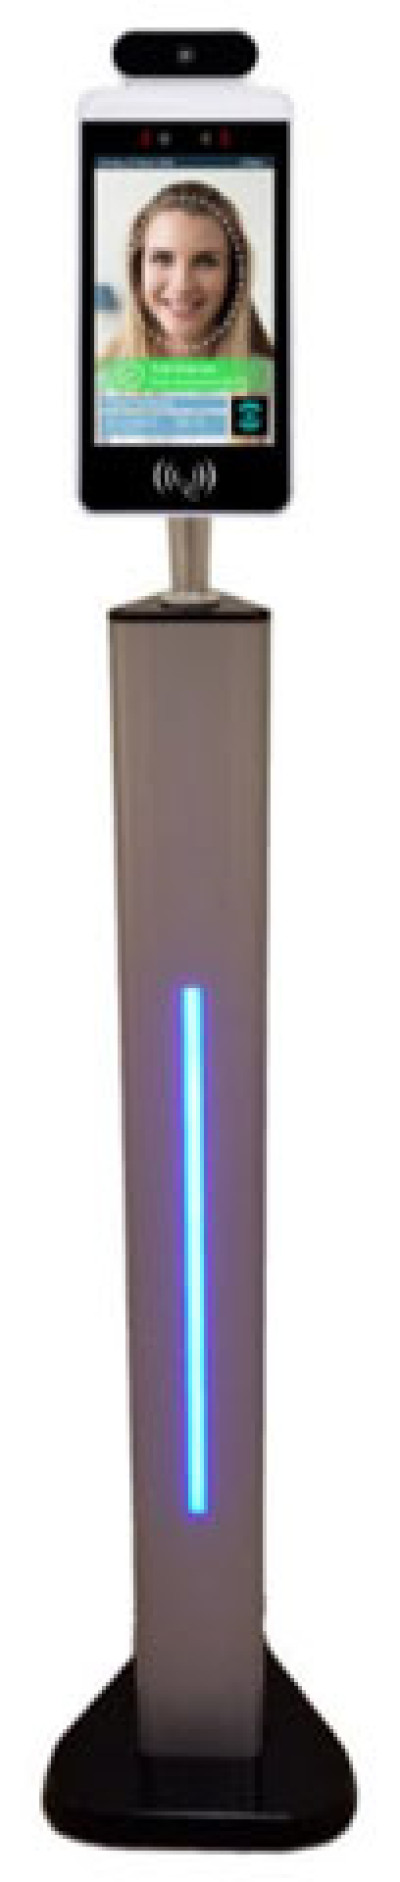 Barcodes Temperature Screening Kiosk ULCD Fixed/Vehicle Mount Data Terminal